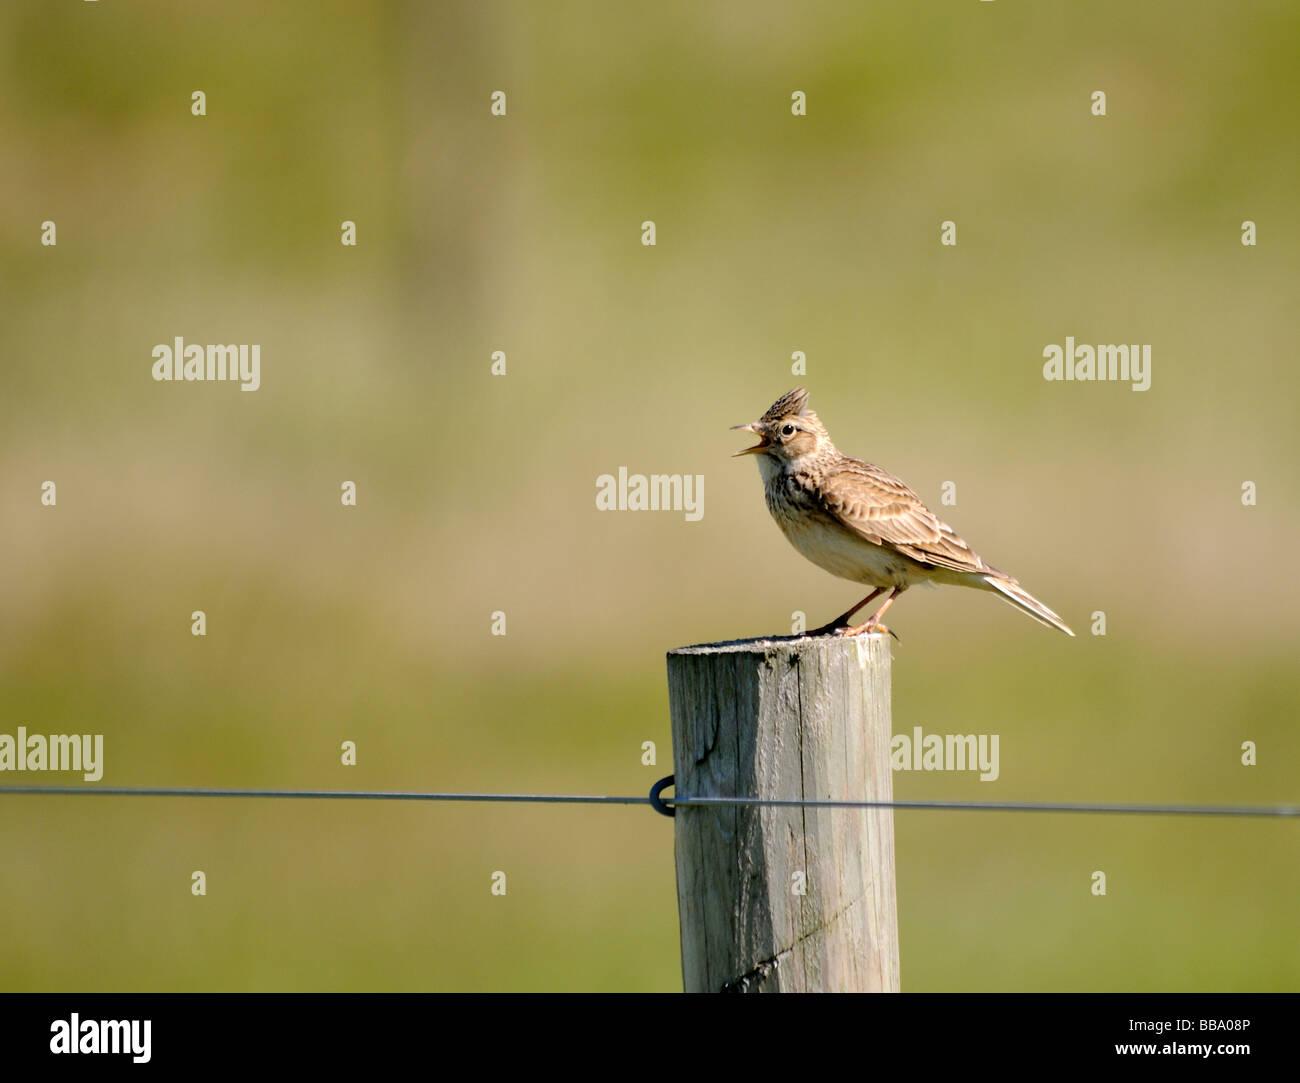 A skylark (Alauda arvensis) stands singing on a fence post. - Stock Image